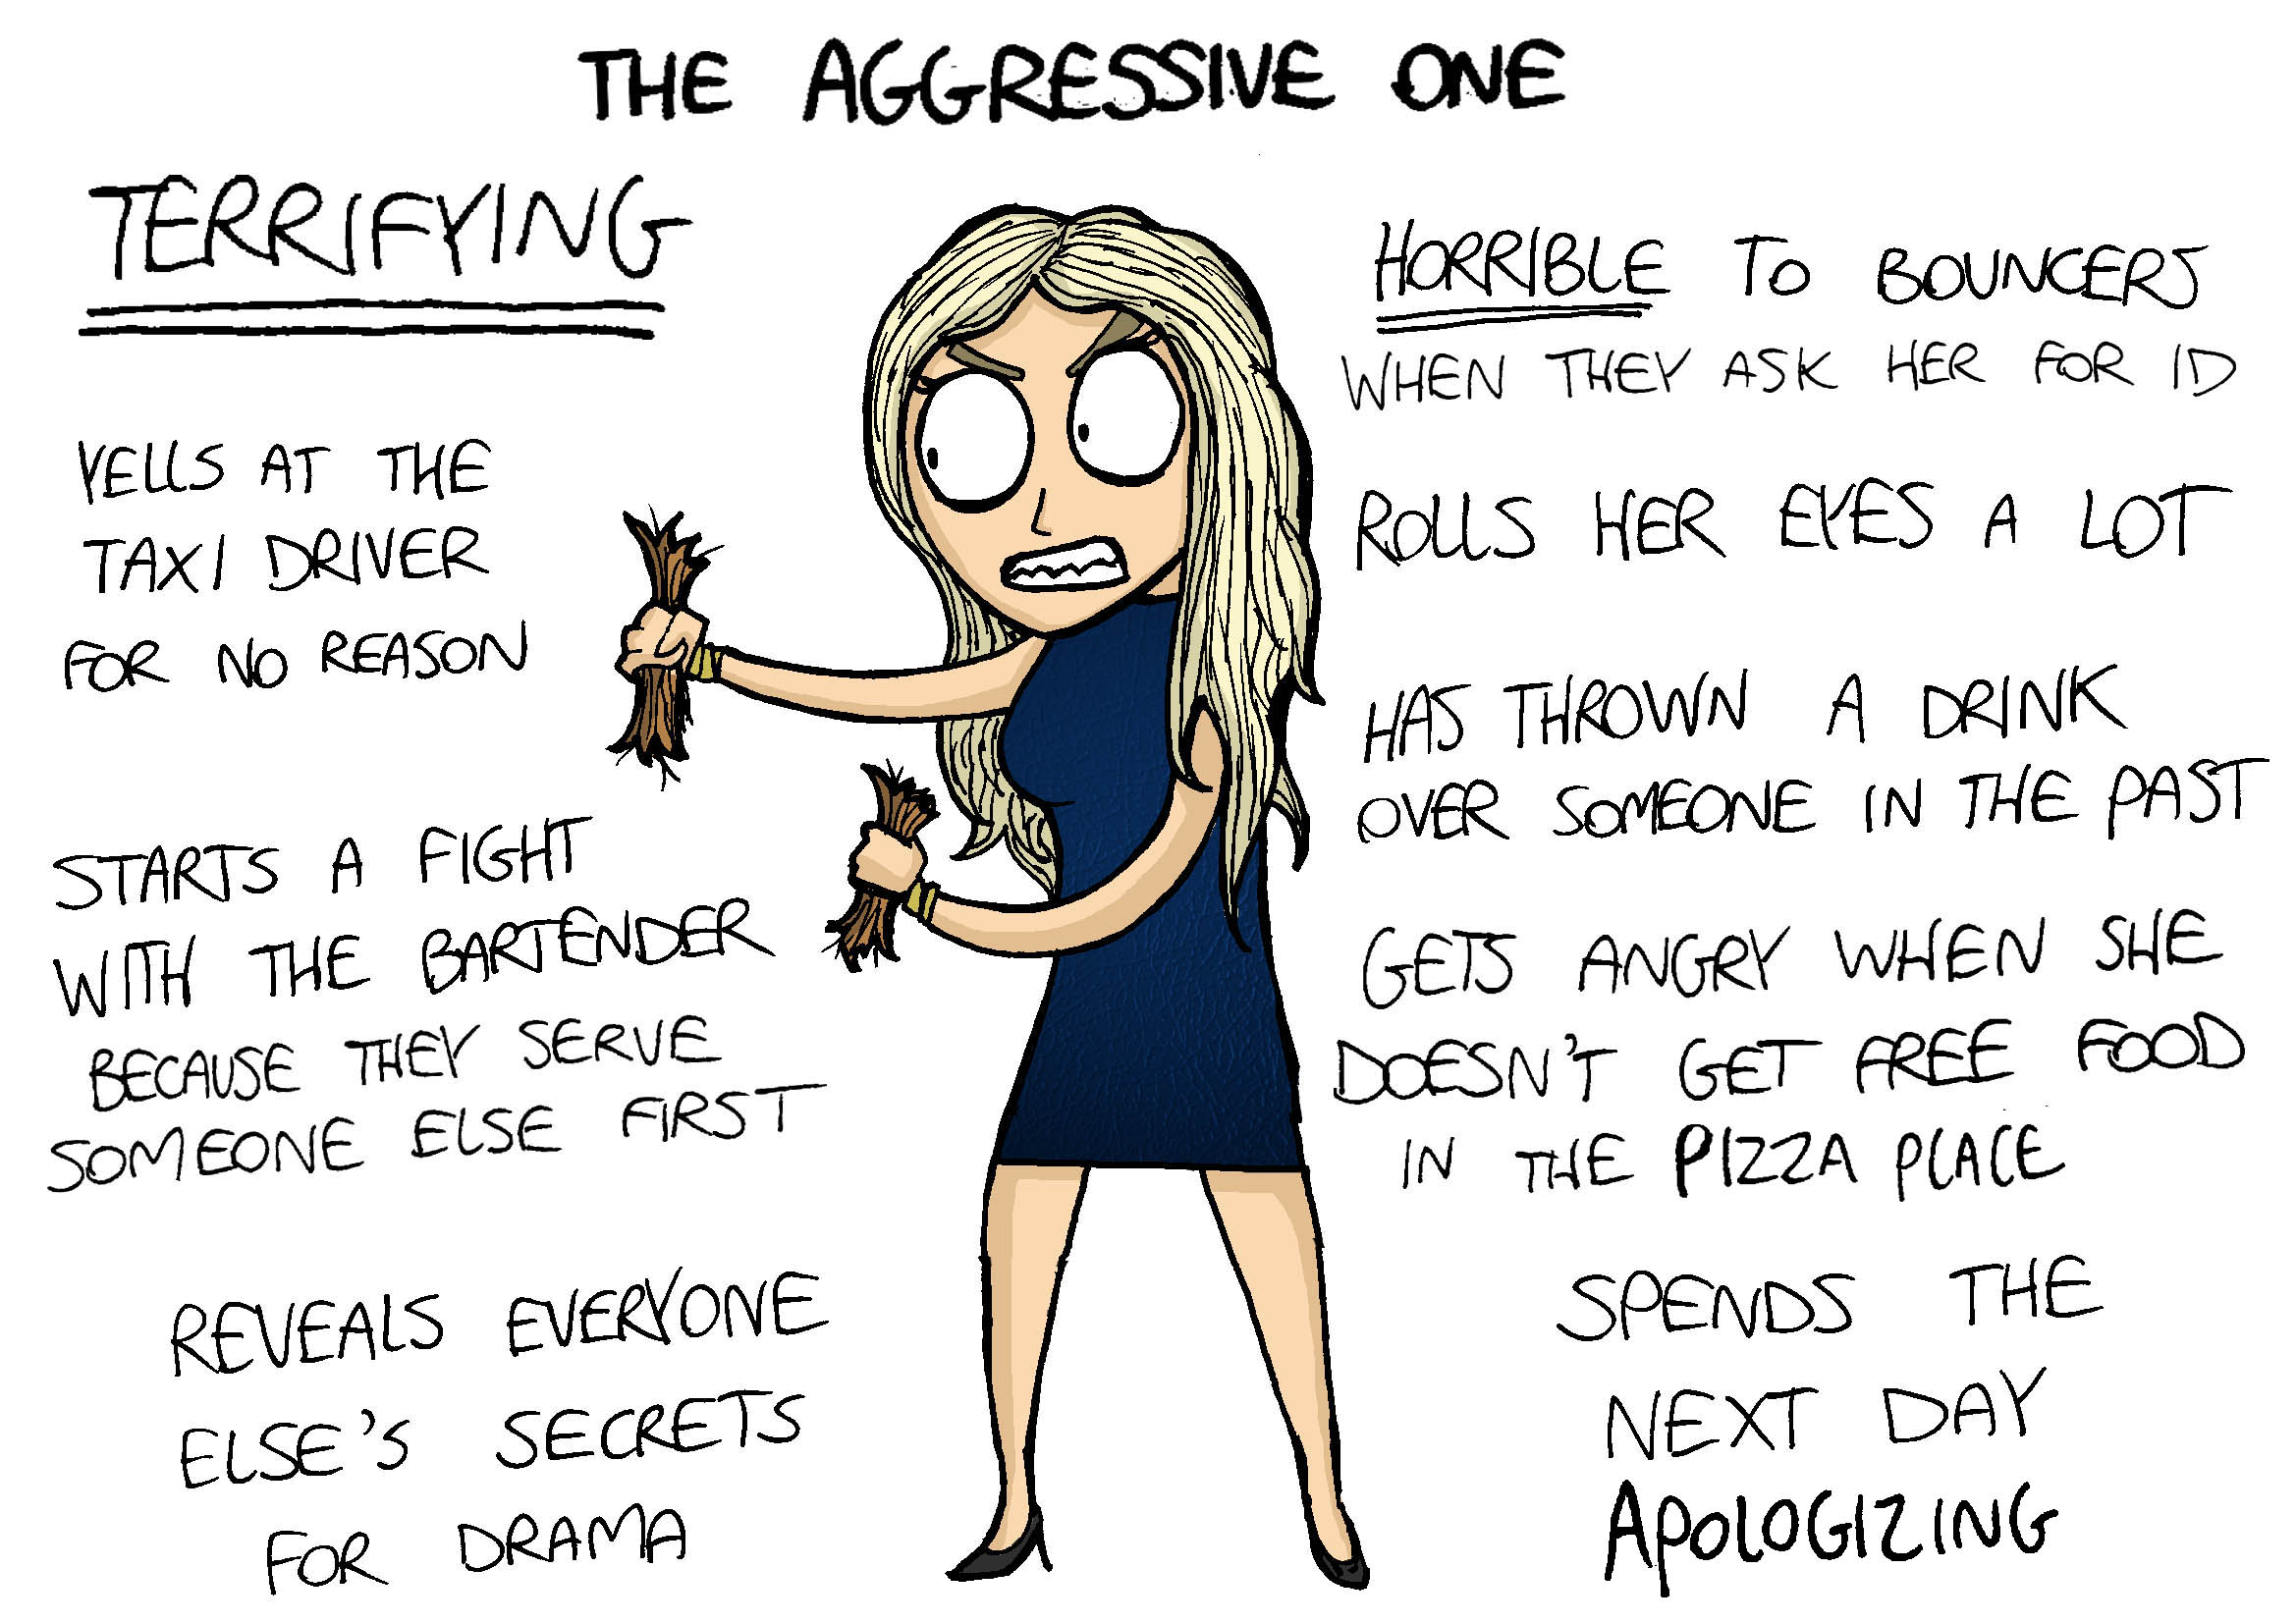 usaggressive